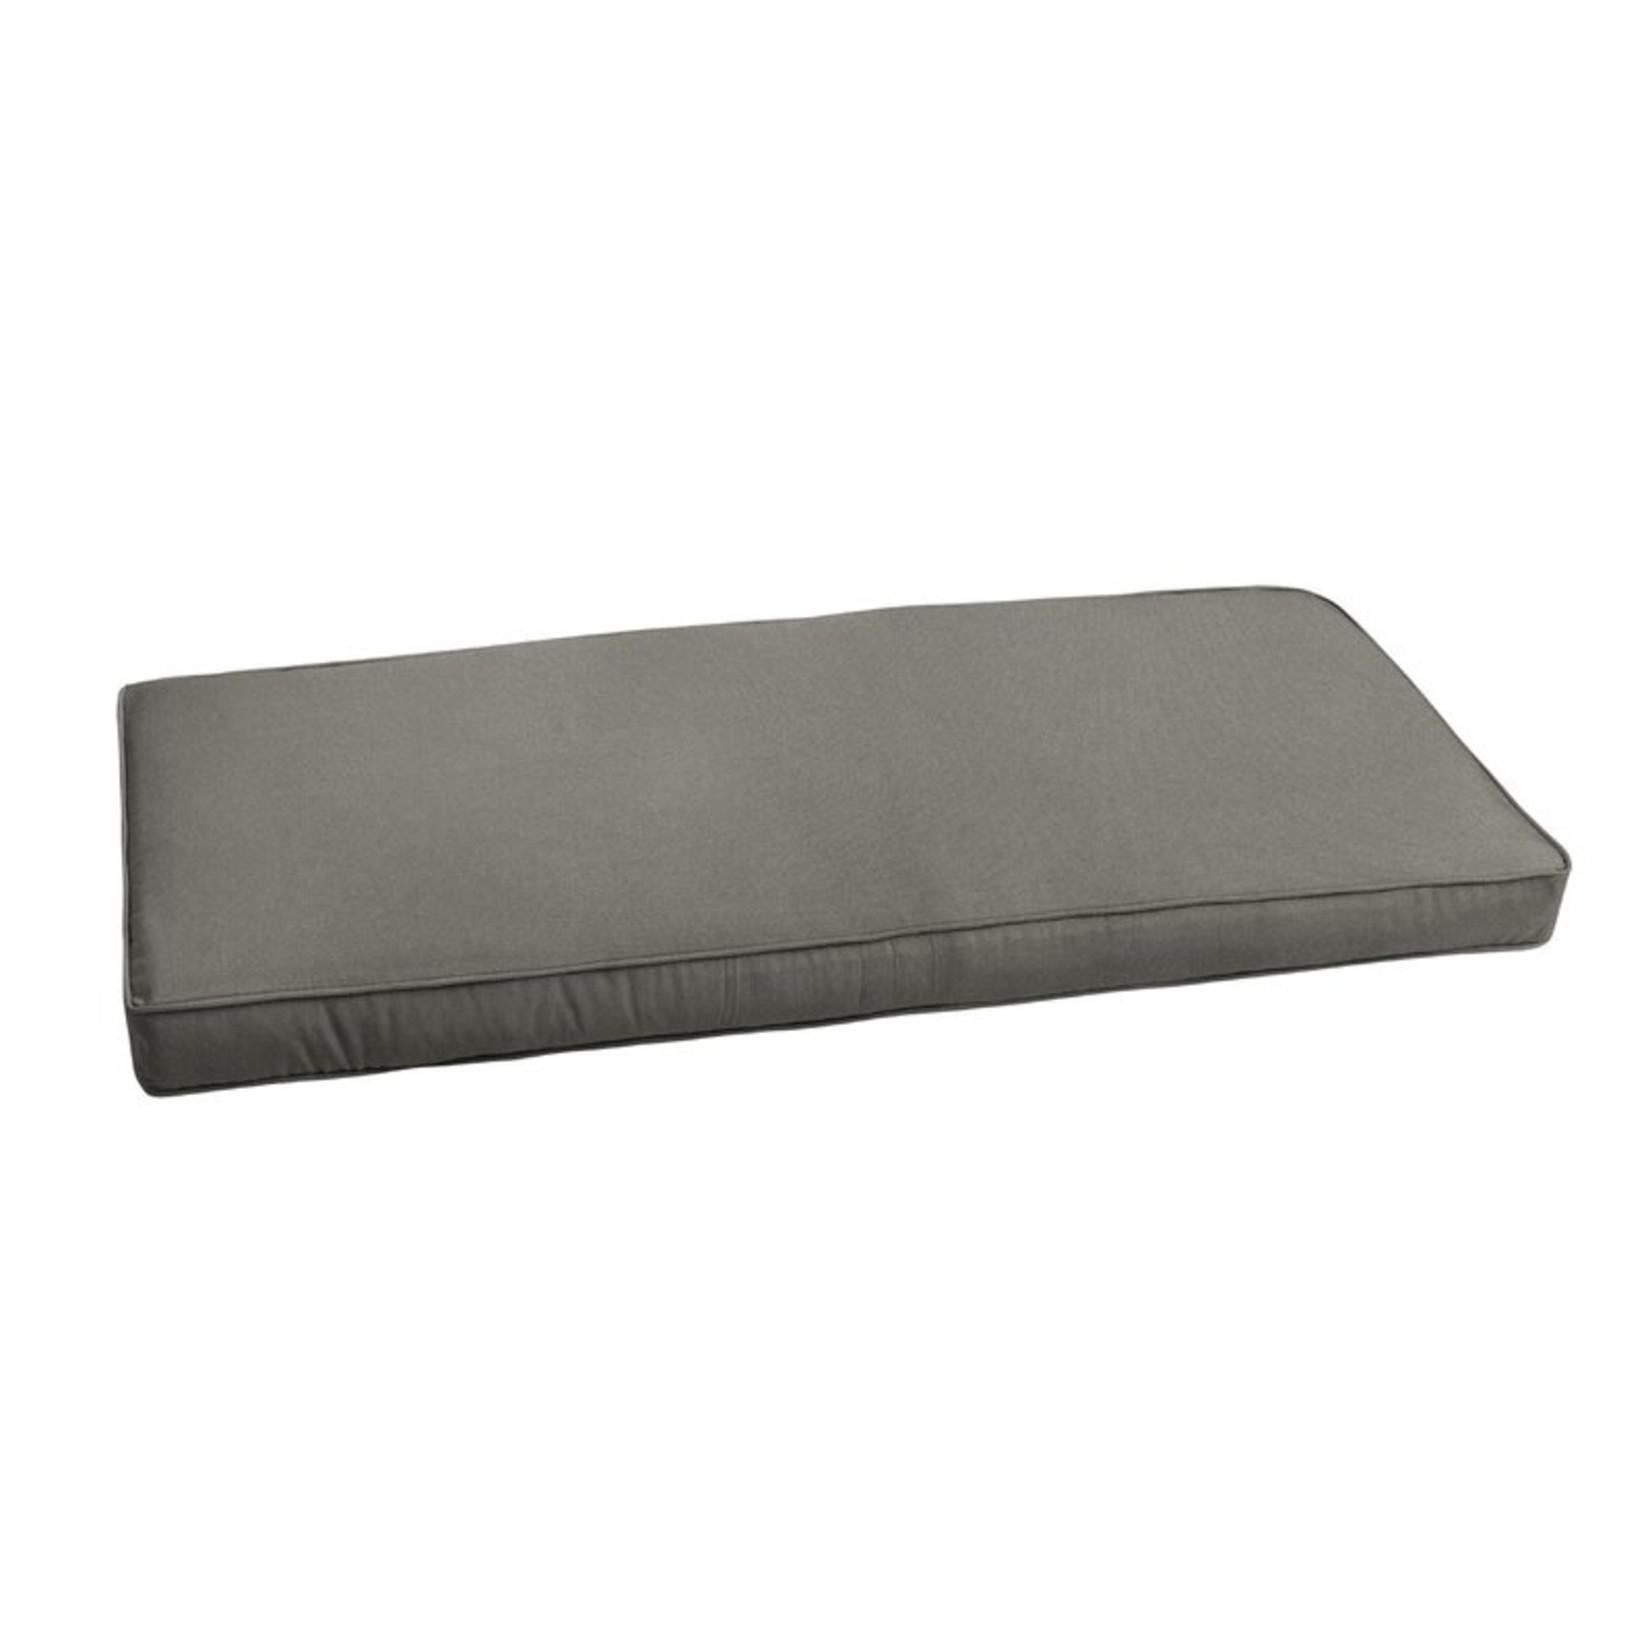 *Outdoor Sunbrella Seat Cushion - Canvas Charcoal